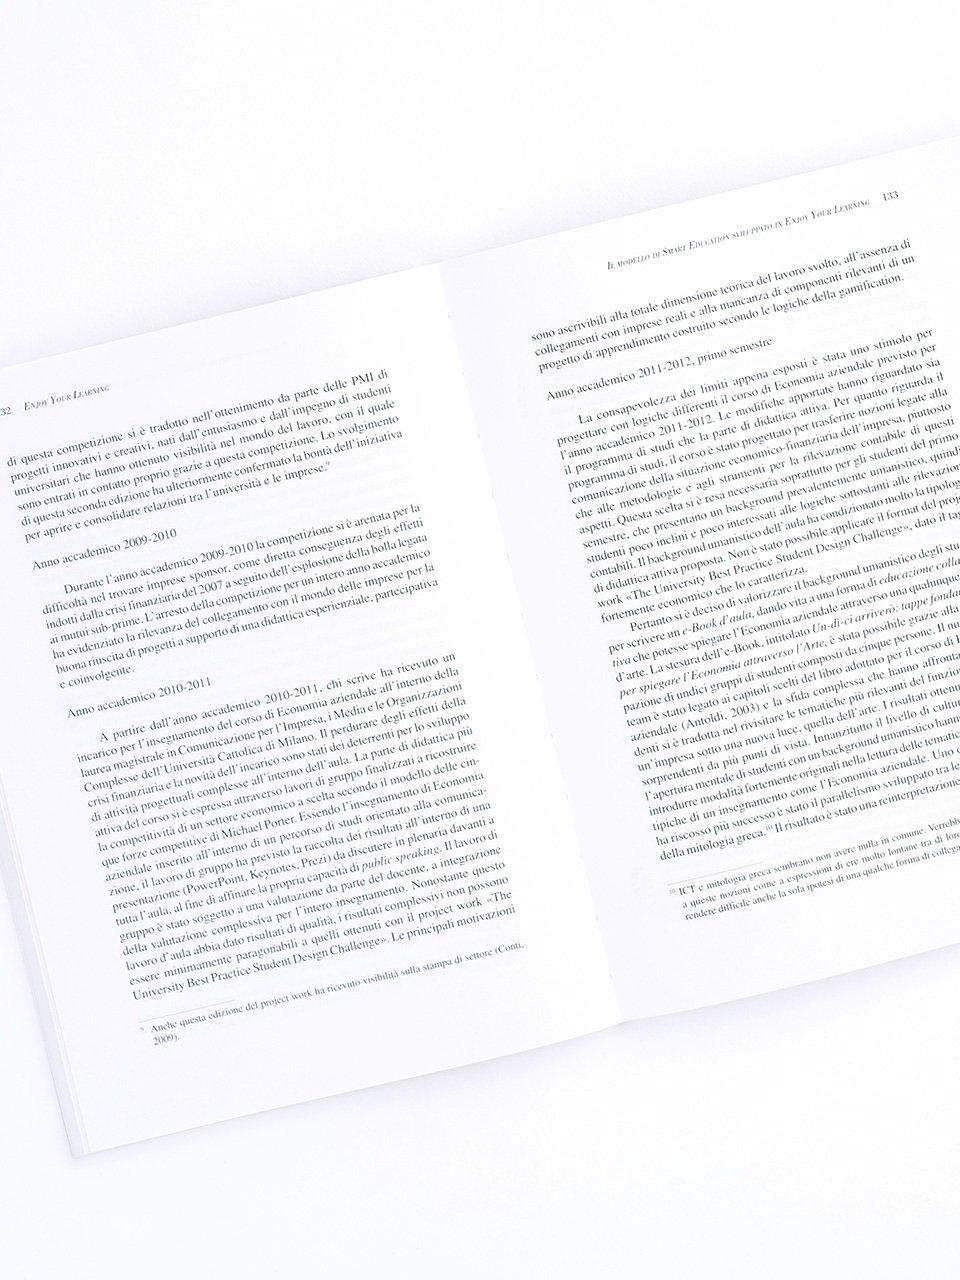 Enjoy Your Learning - Libri - Erickson 2